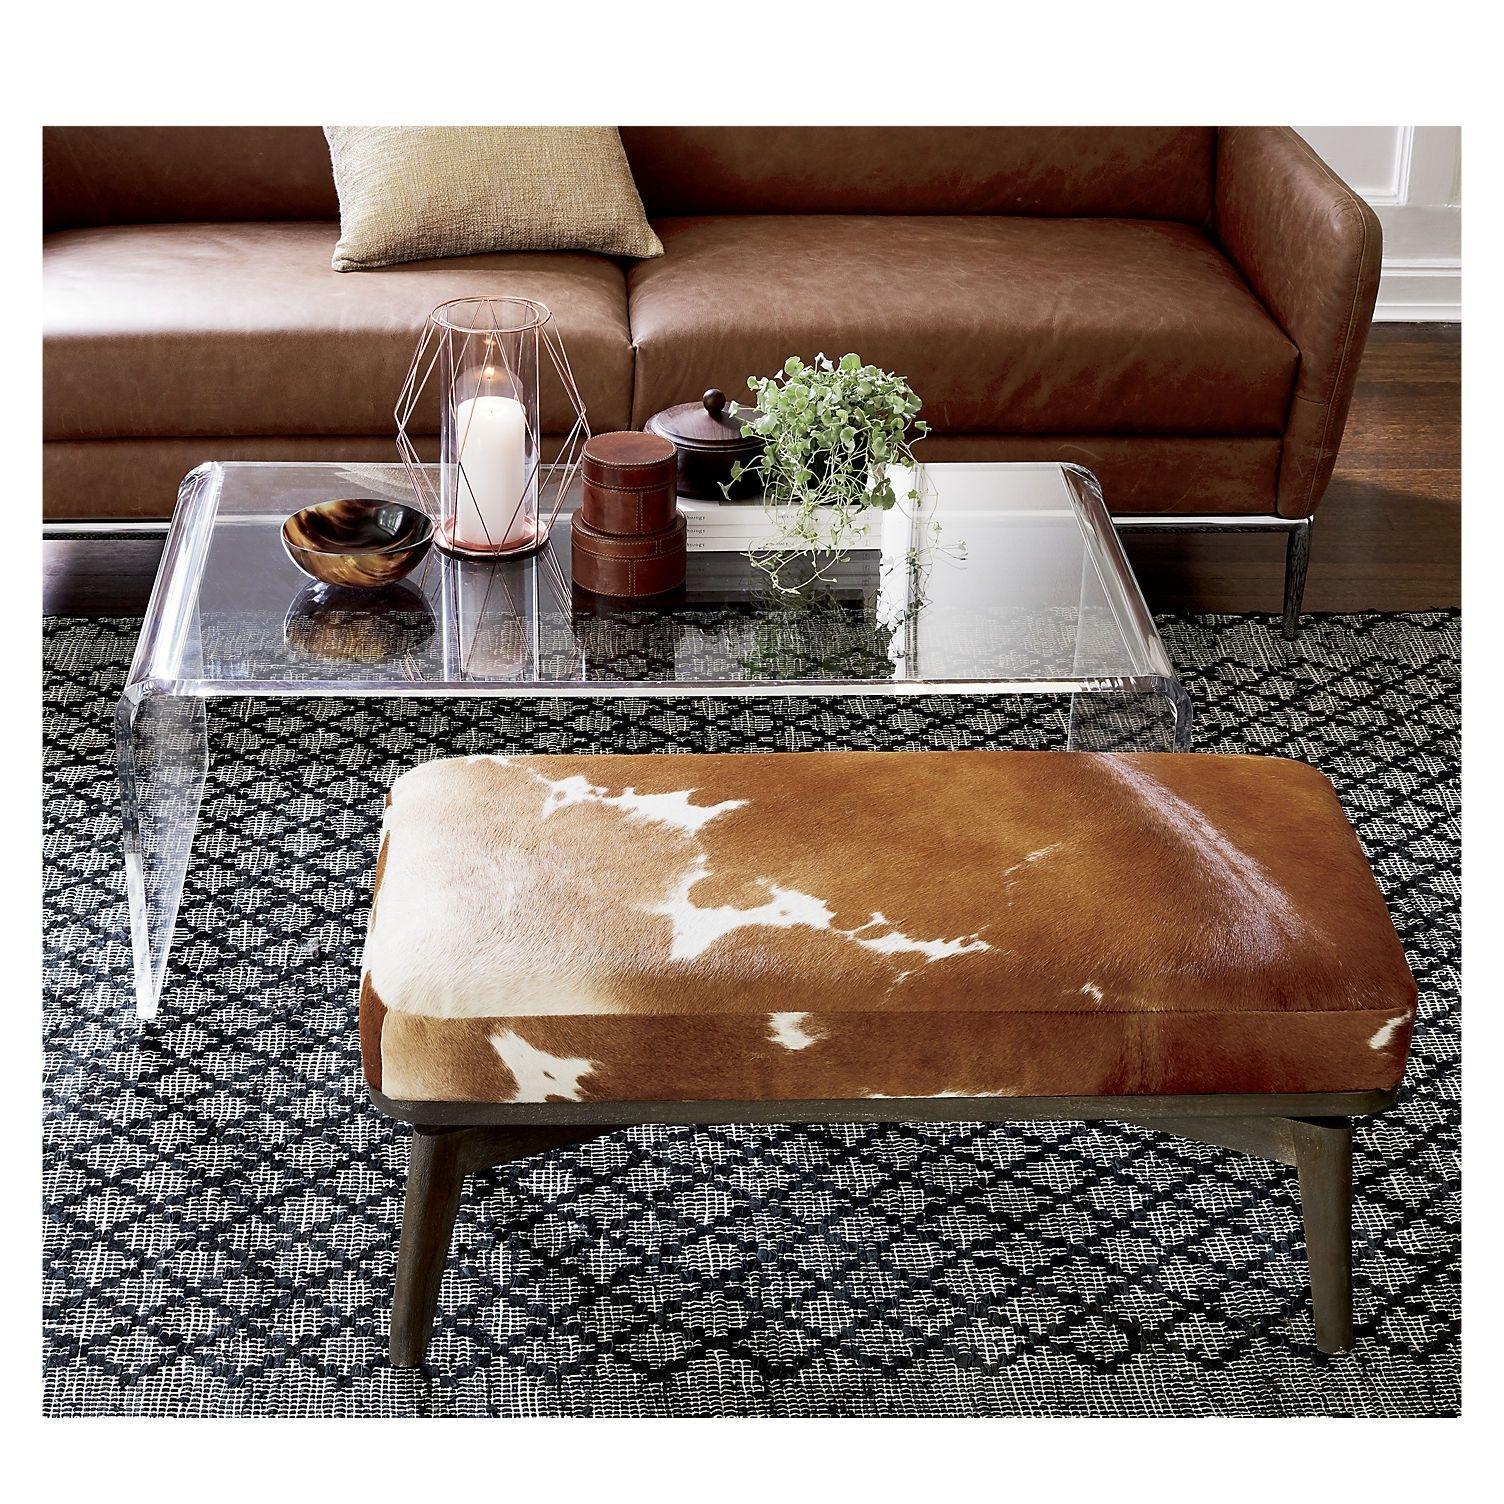 Peekaboo Acrylic Coffee Table In 2018 | Style And More | Pinterest For Peekaboo Acrylic Coffee Tables (Photo 28 of 30)